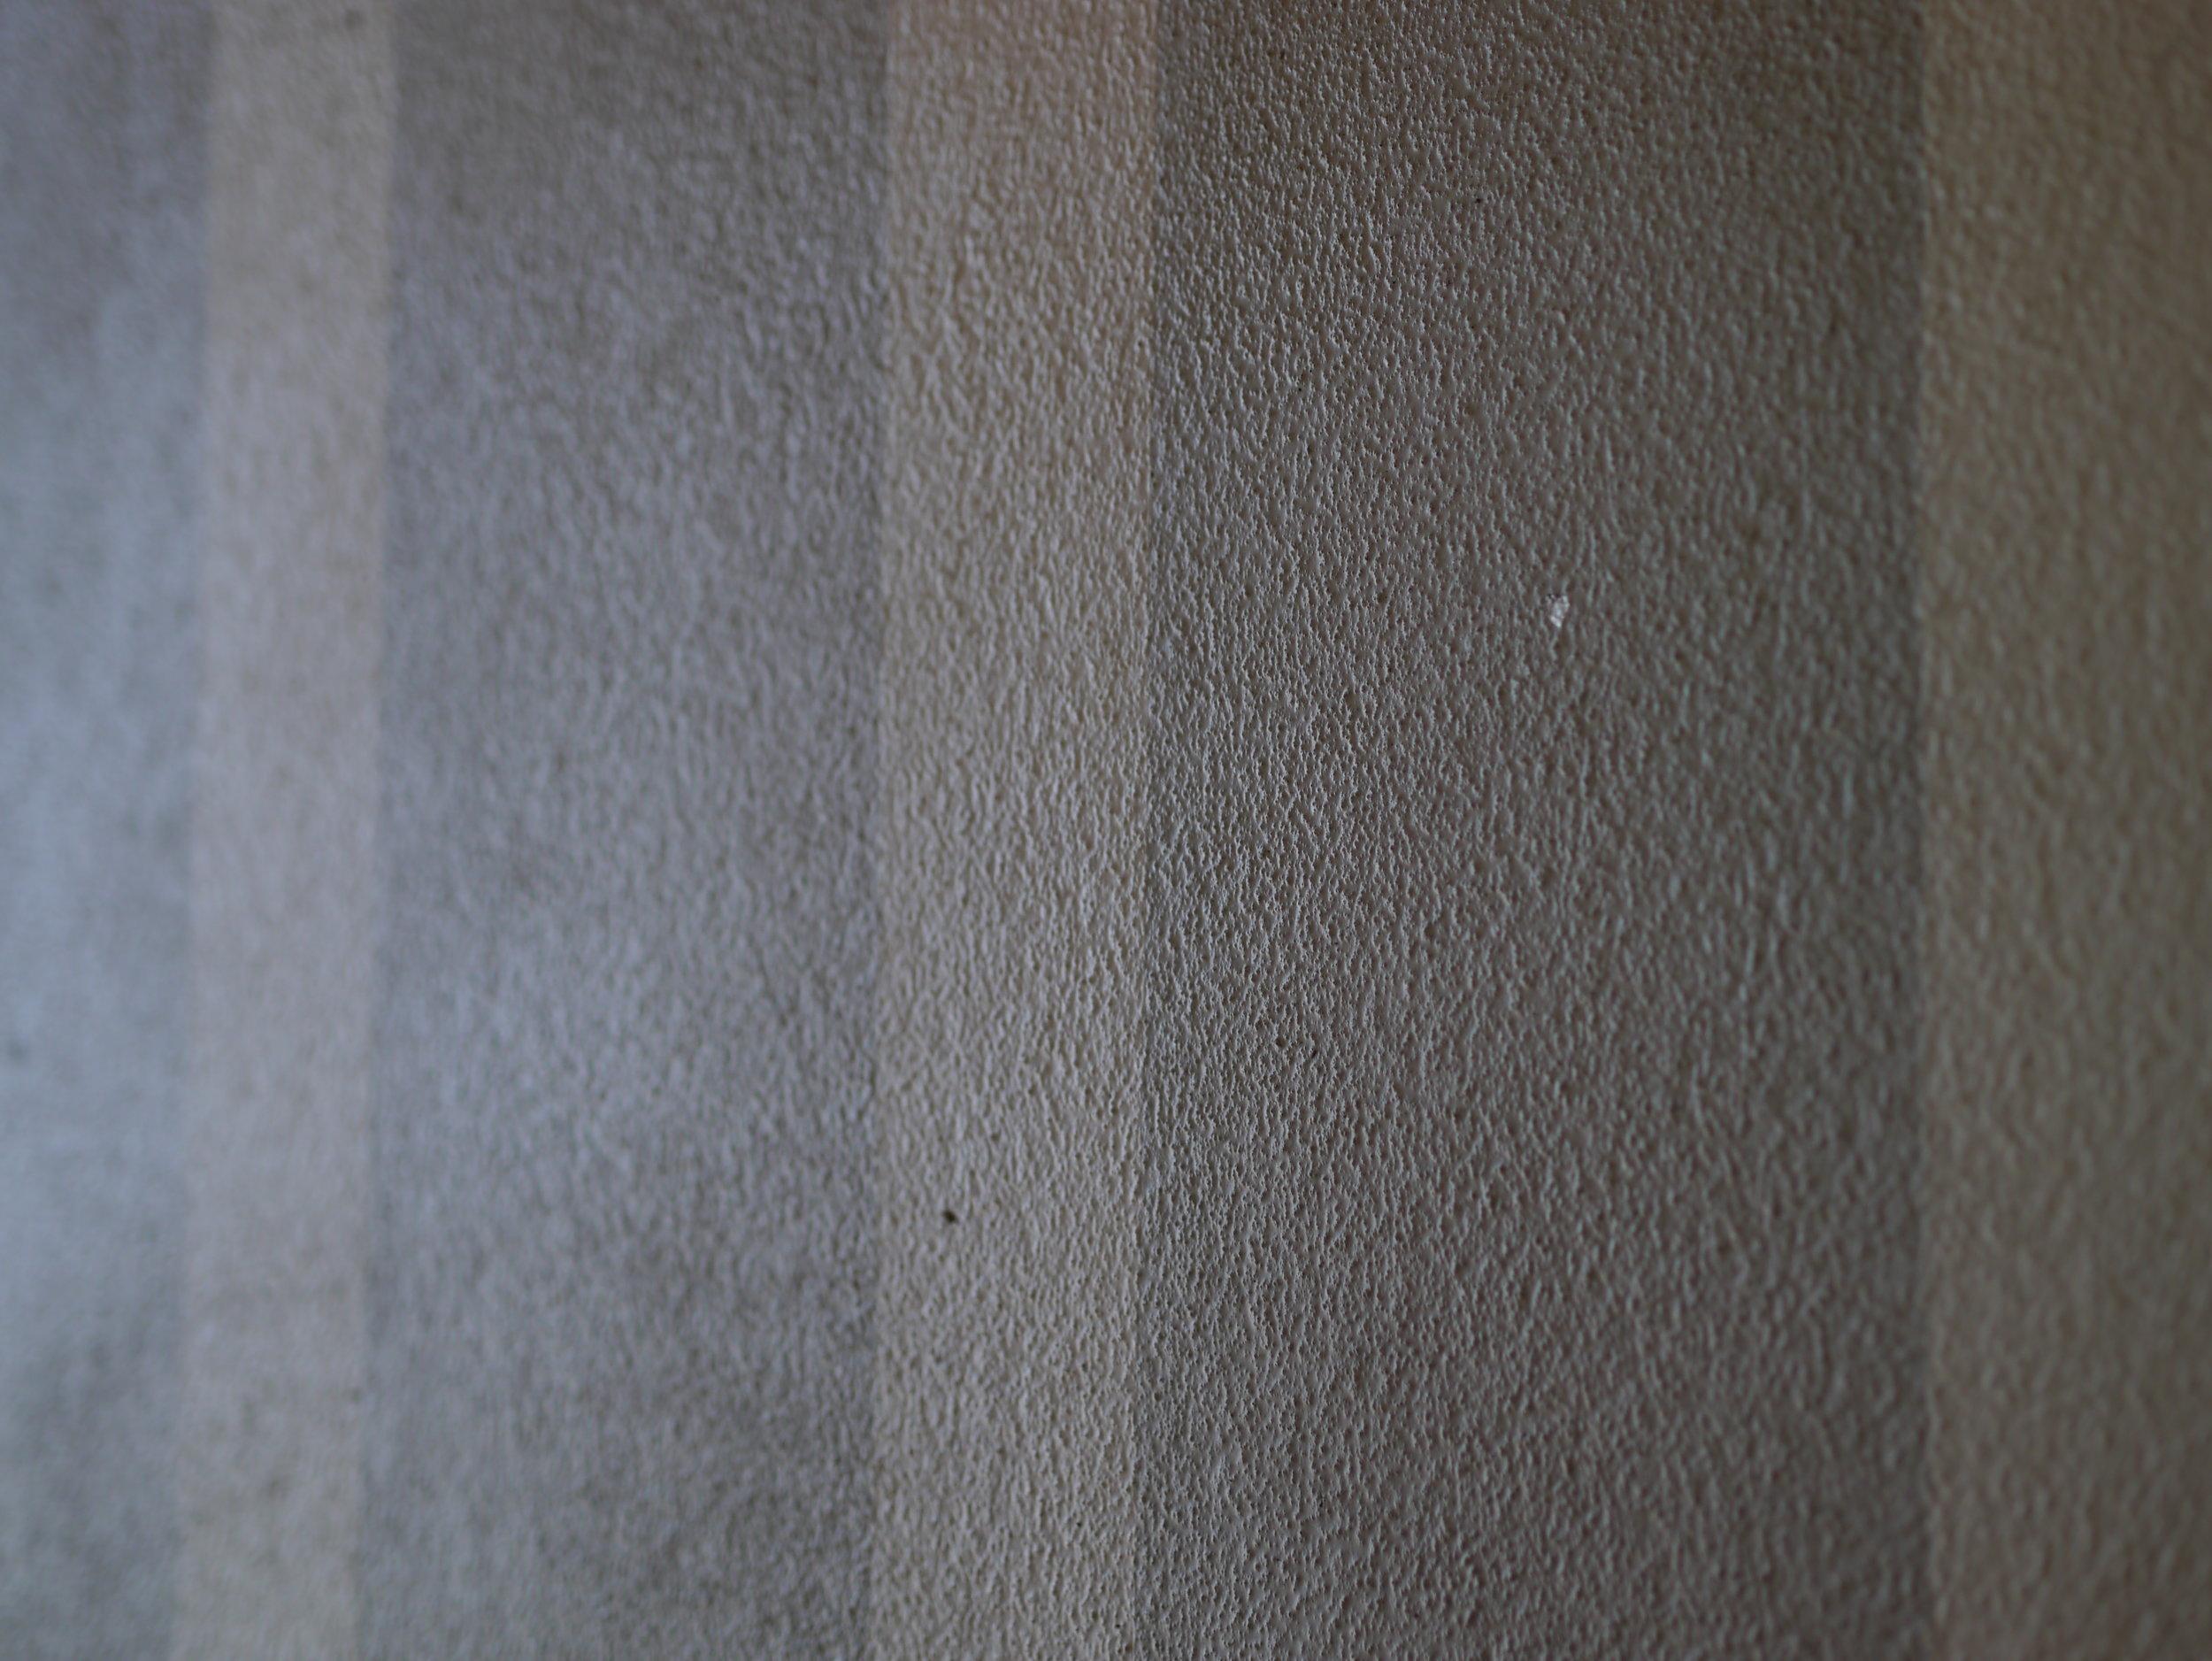 P1190455.JPG